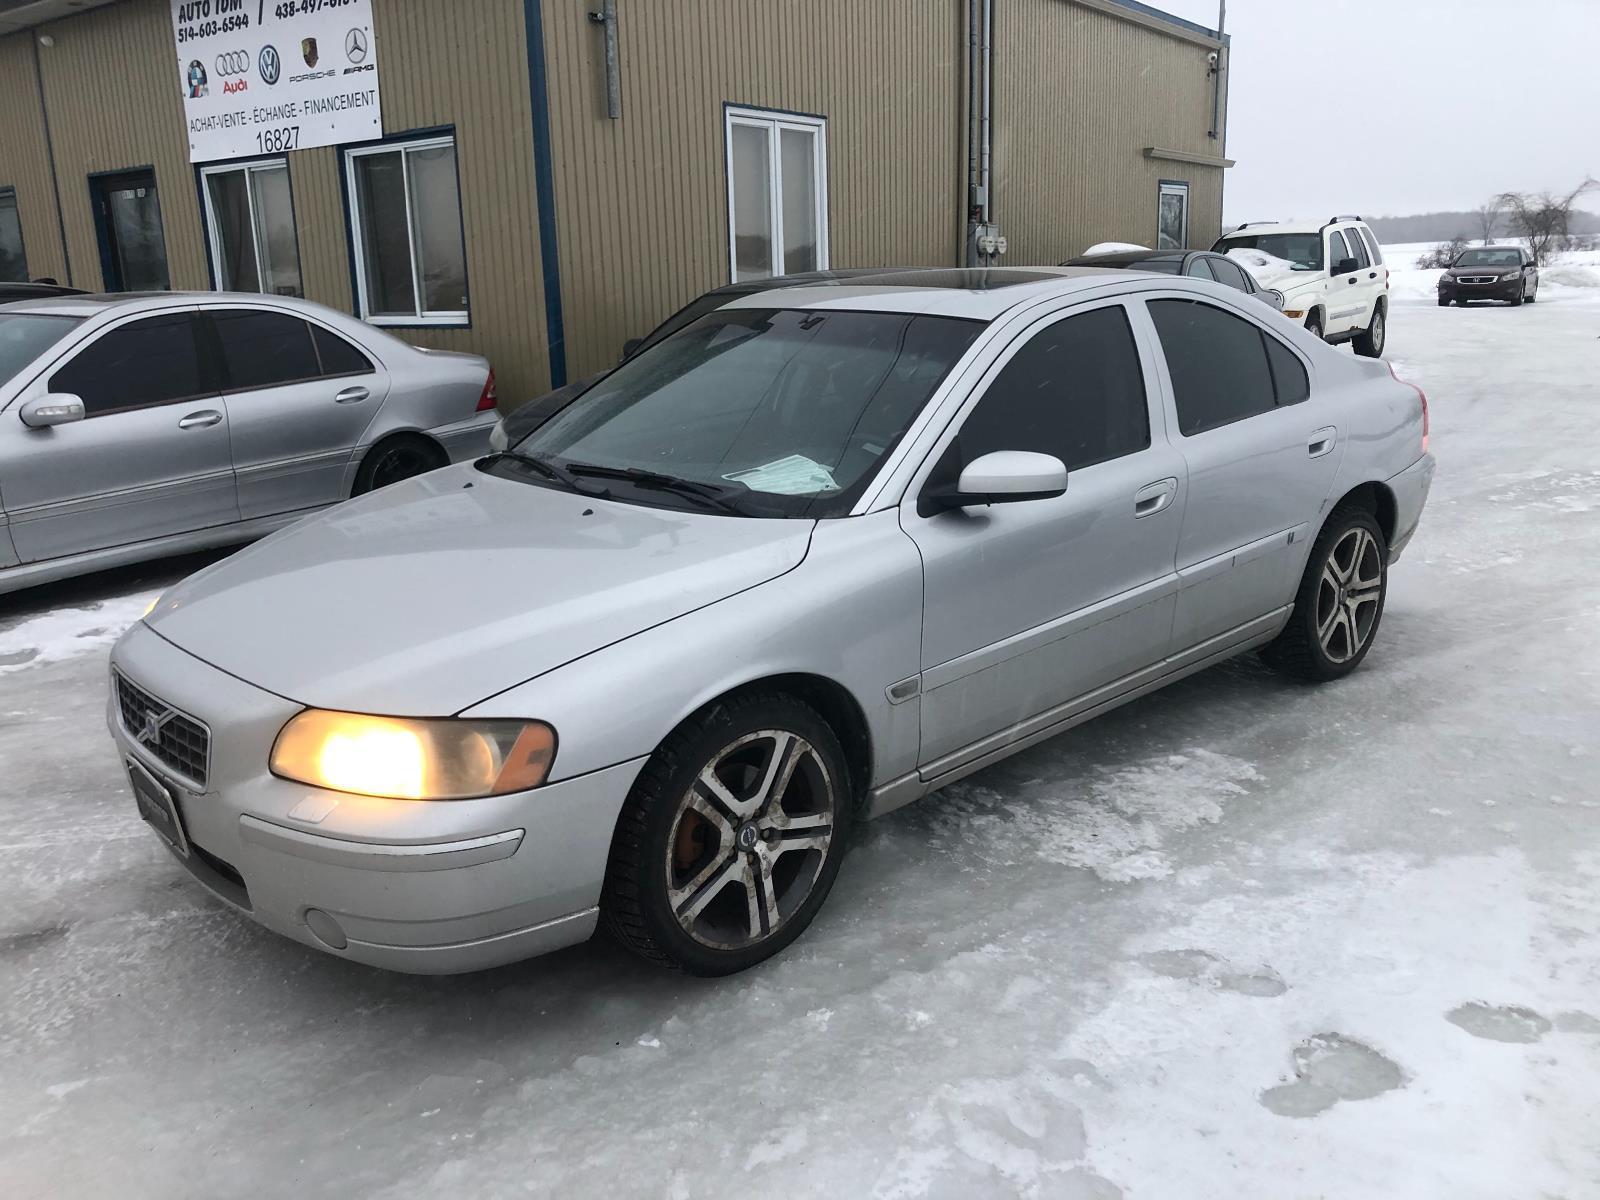 Volvo S60 2006 5146036544 2.5L Turbo Auto AWD Spec Ed